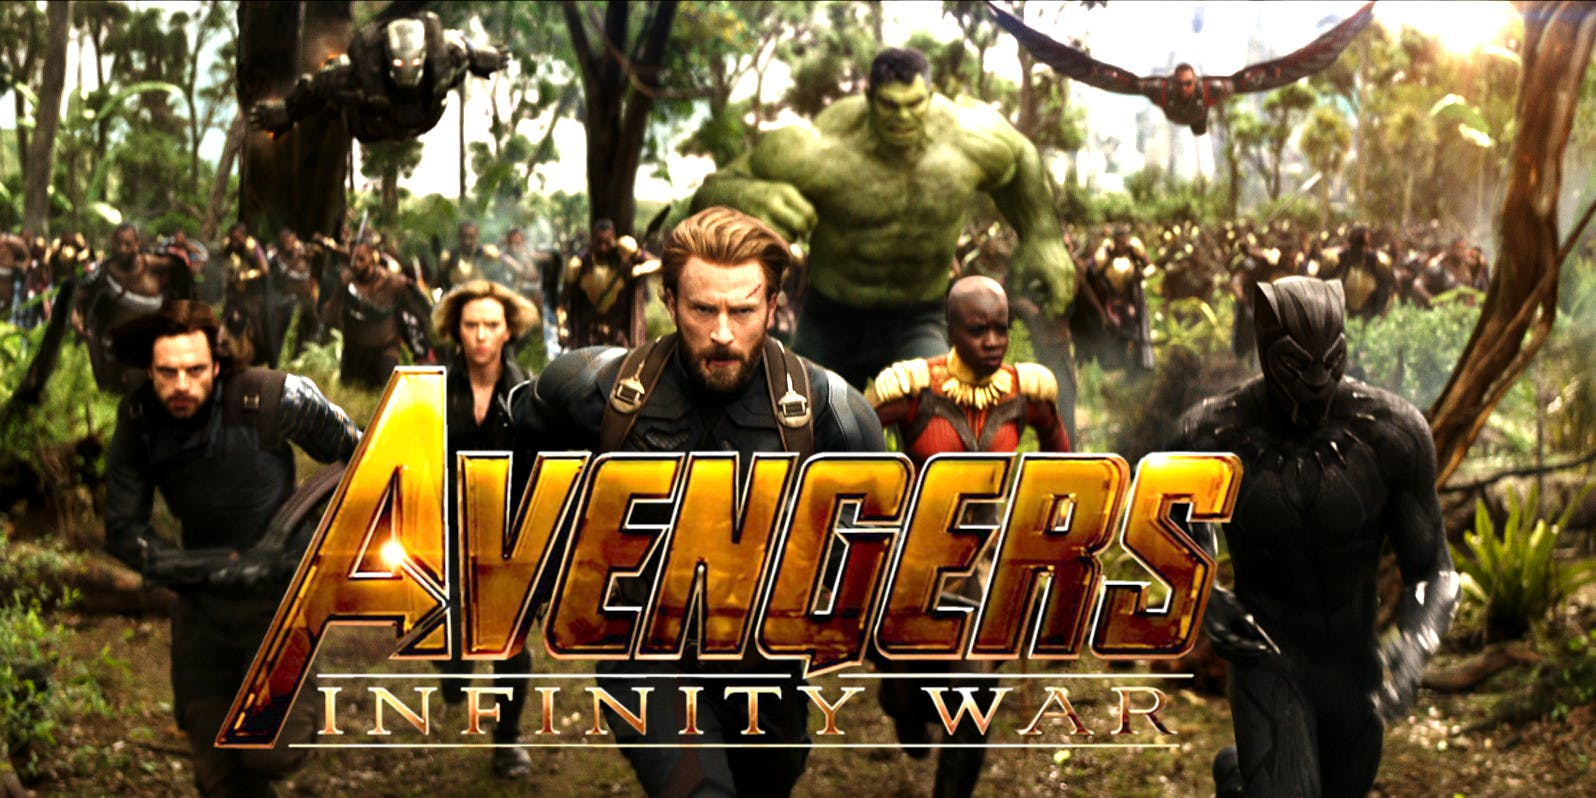 Avengers-Infinity-War-Team-Cap-Banner.jpg